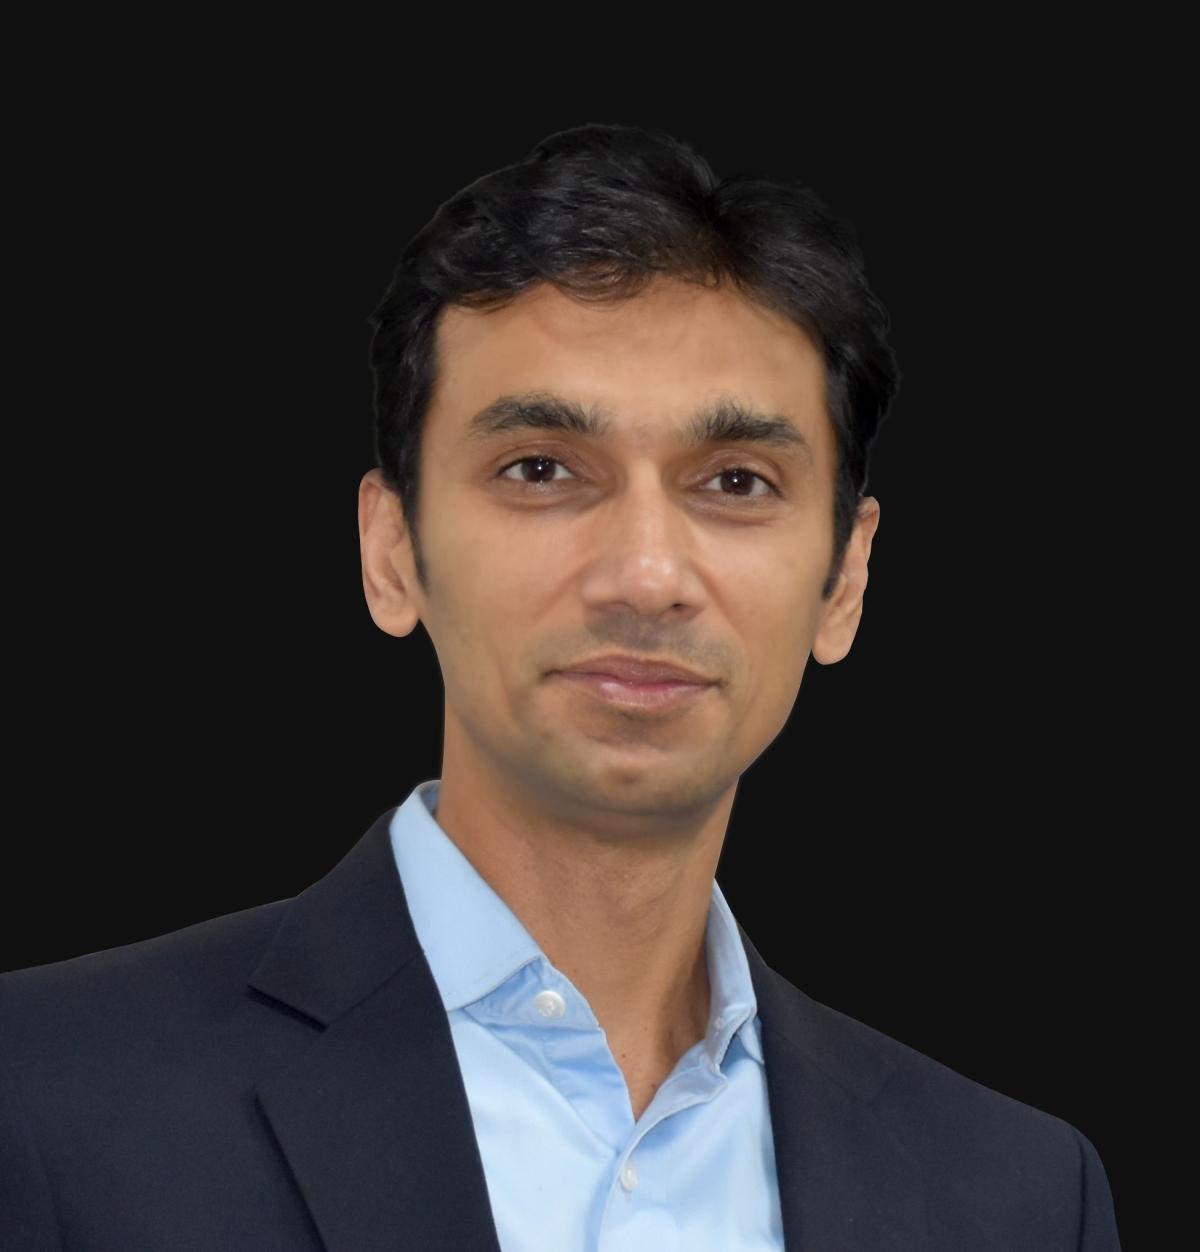 Chandramohan Mehra